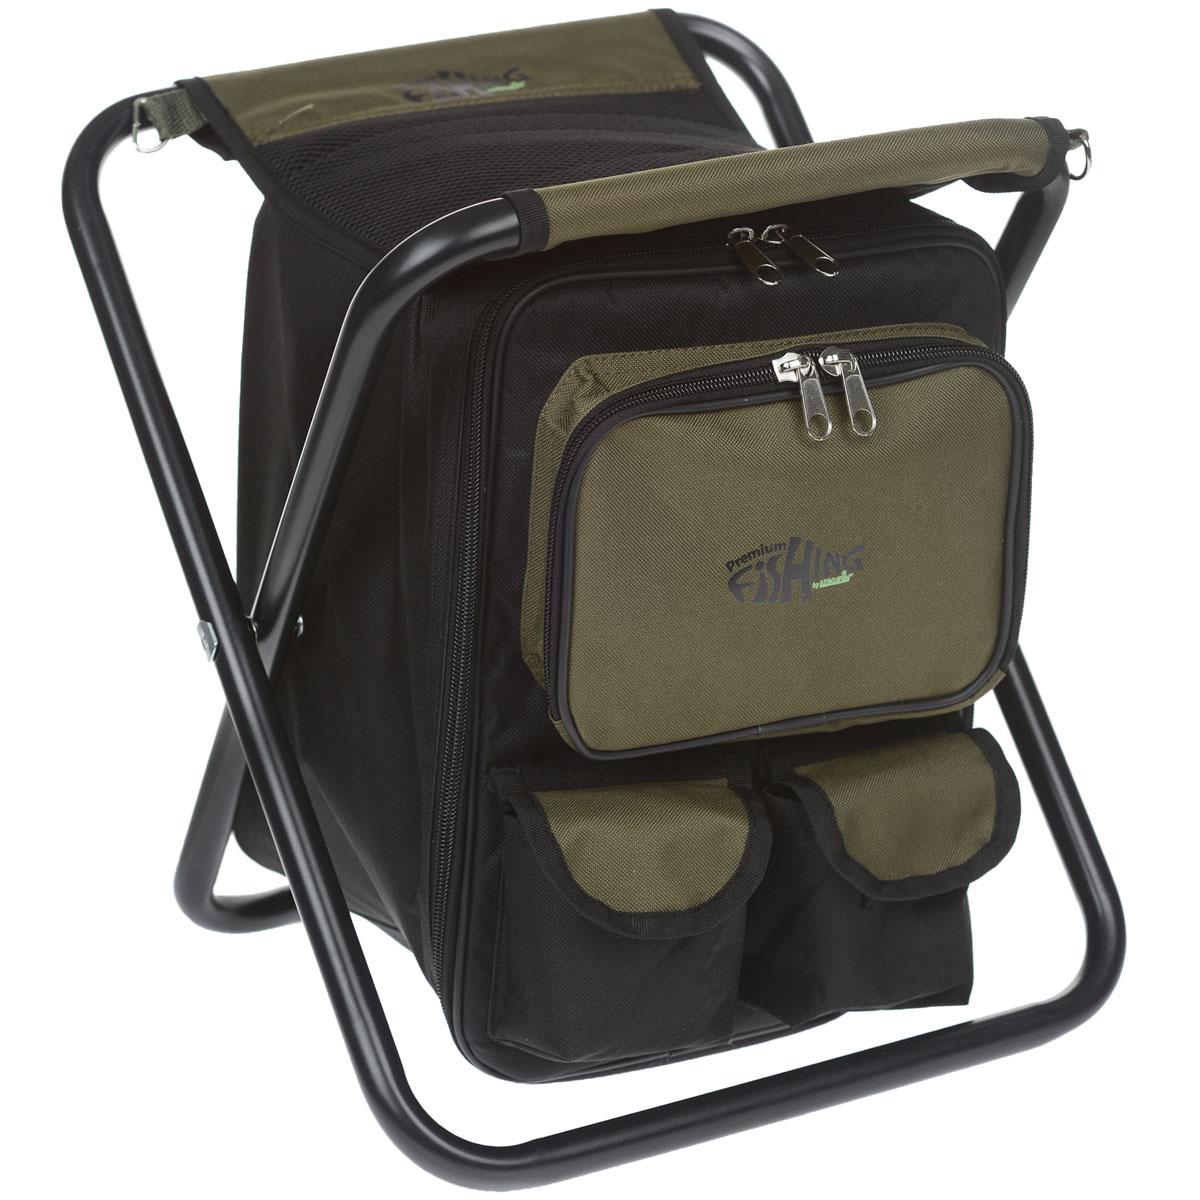 Стул-рюкзак Norfin Luton NF, цвет: хаки сумка norfin dry case 02 nf 40307